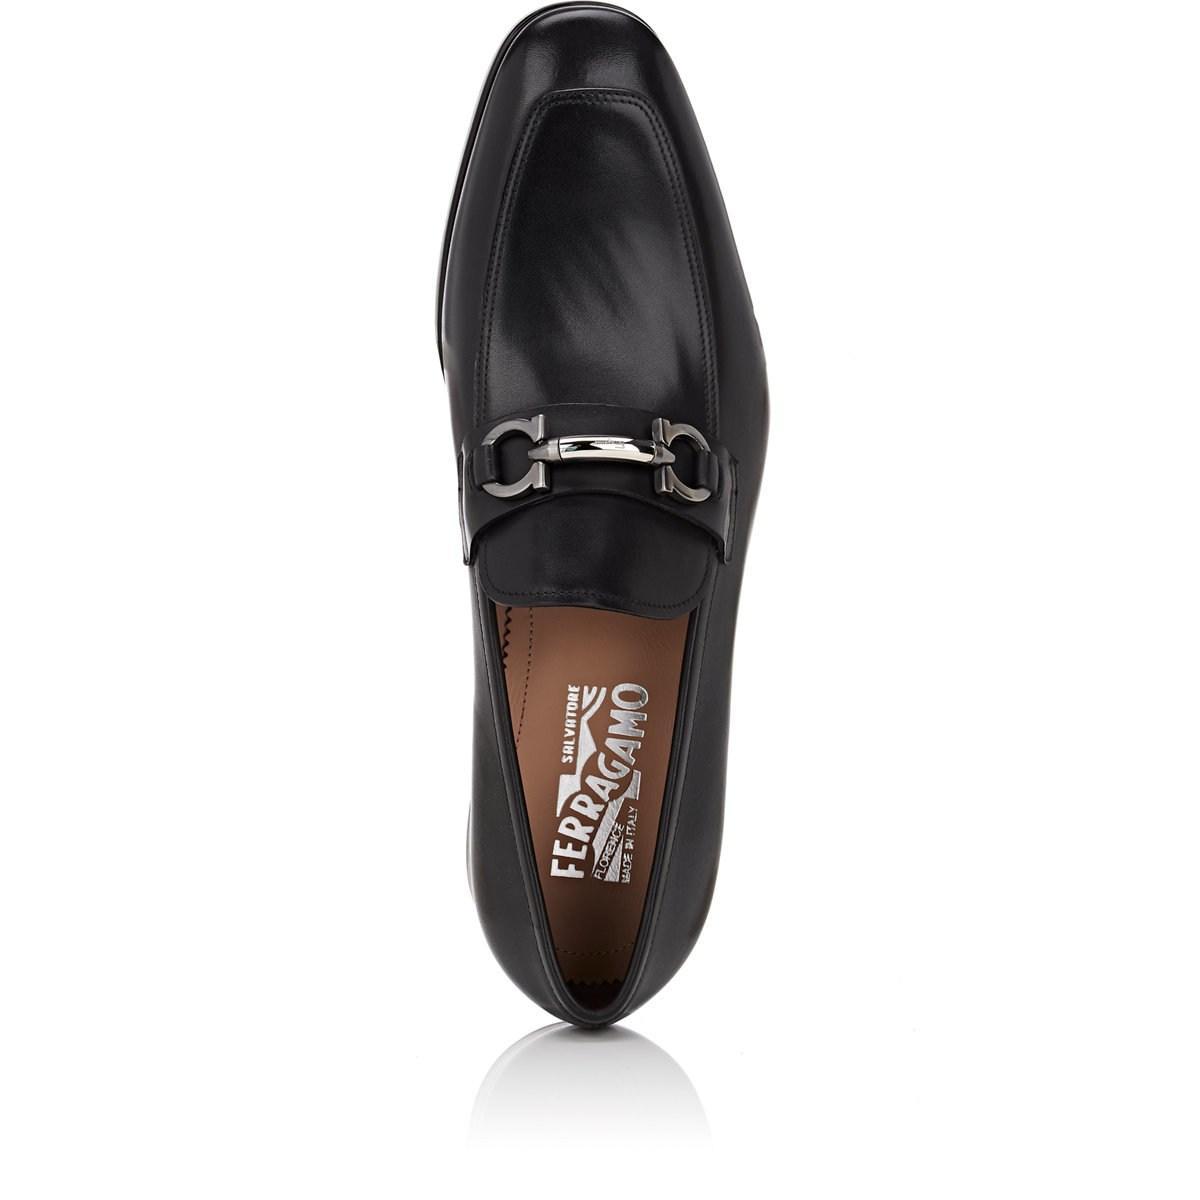 3ff4ea0bcb22 Ferragamo - Black Benford Leather Loafers for Men - Lyst. View fullscreen